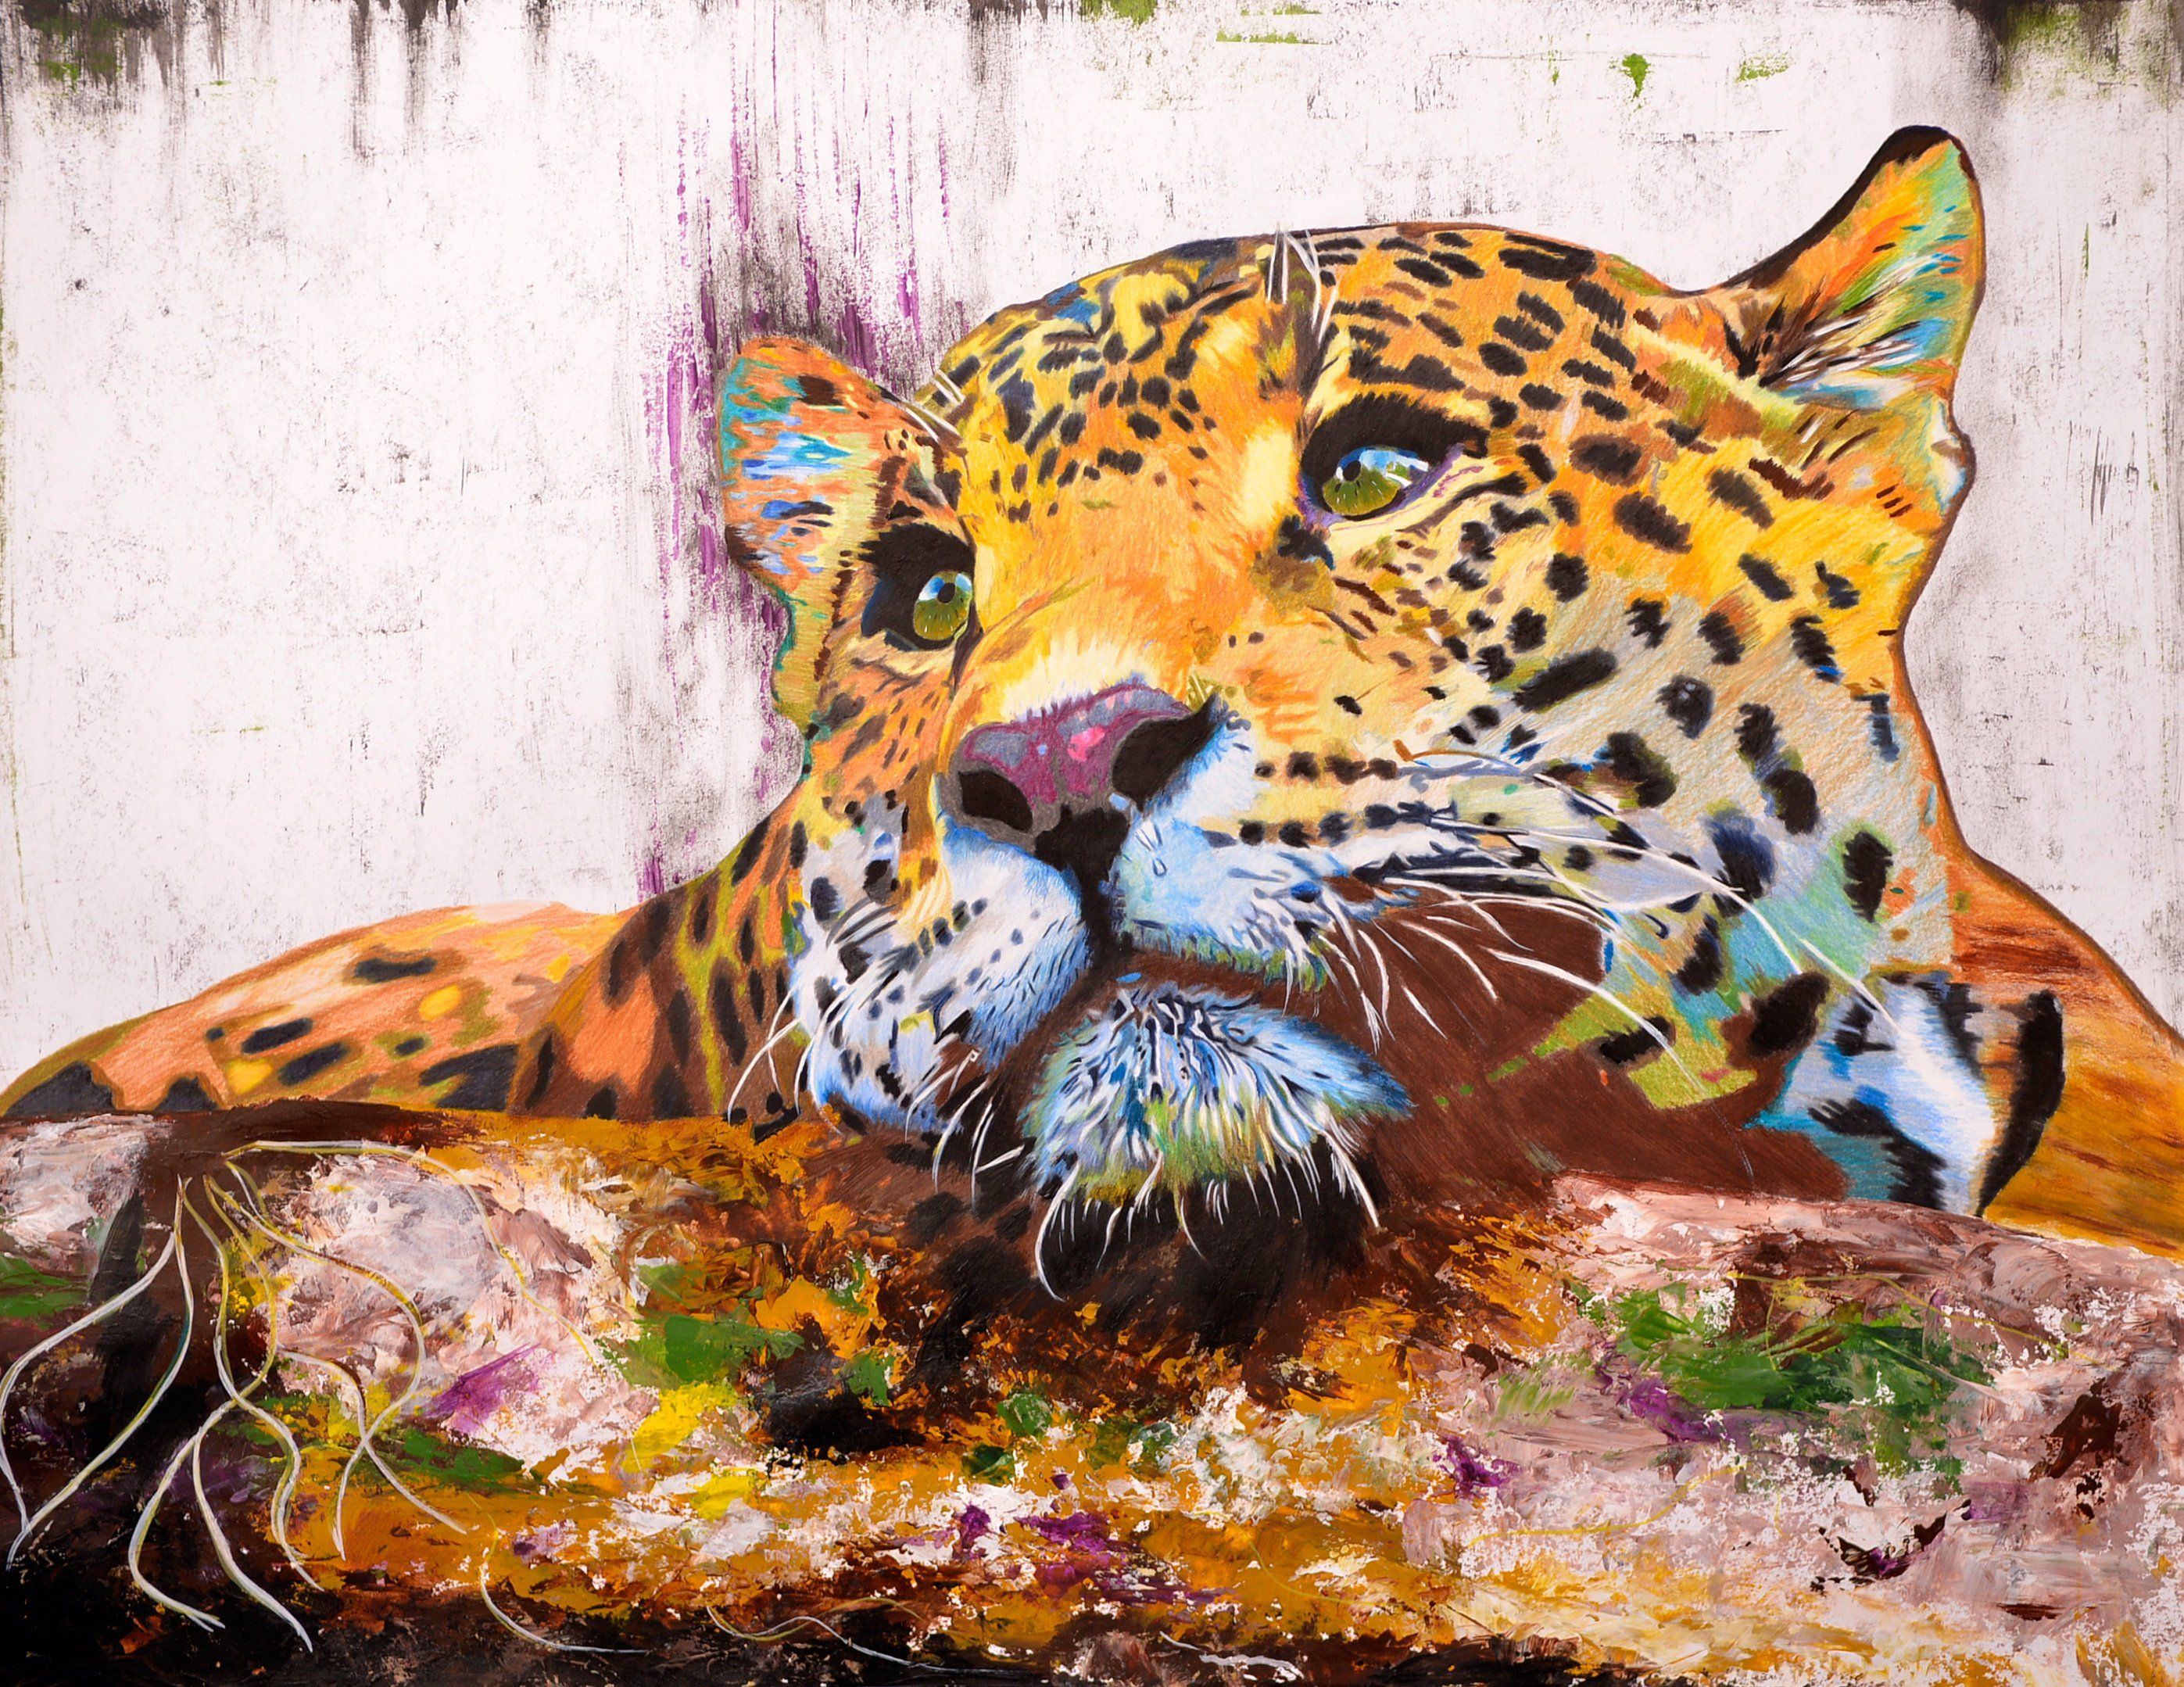 Jaguar Print, Póster Jaguar, Dibujo de Jaguar, Impresiones de Jaguar, Jaguar Art, Jaguar Art Print, Jaguar Wall Art, Safari animals, Jaguar